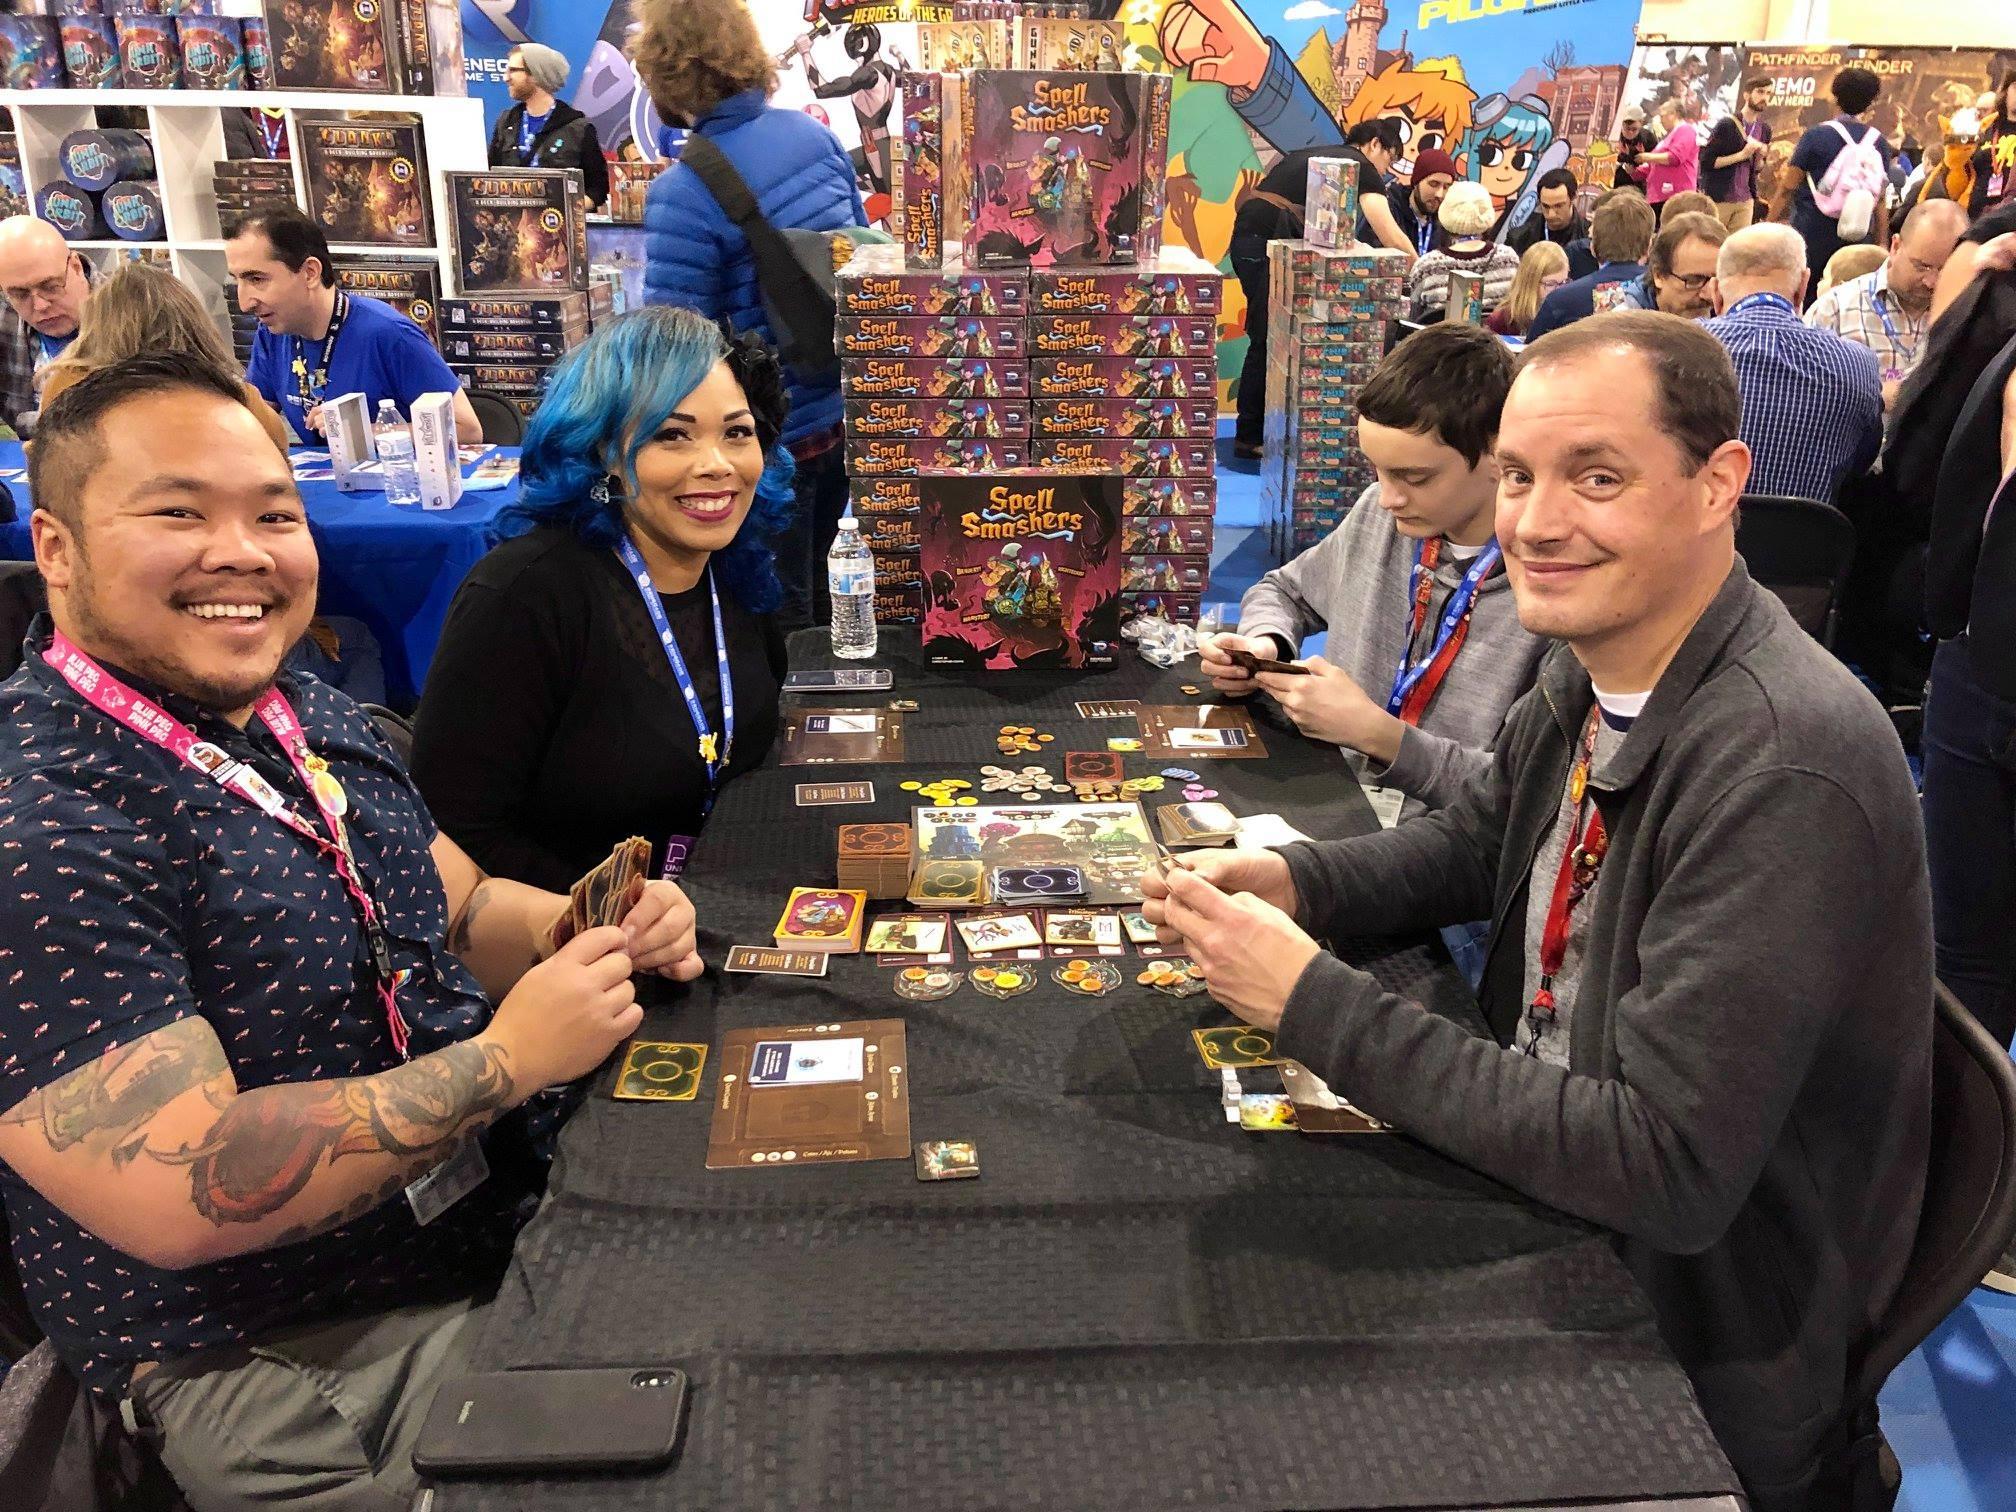 Slinging spells and having fun in Spell Smashers!